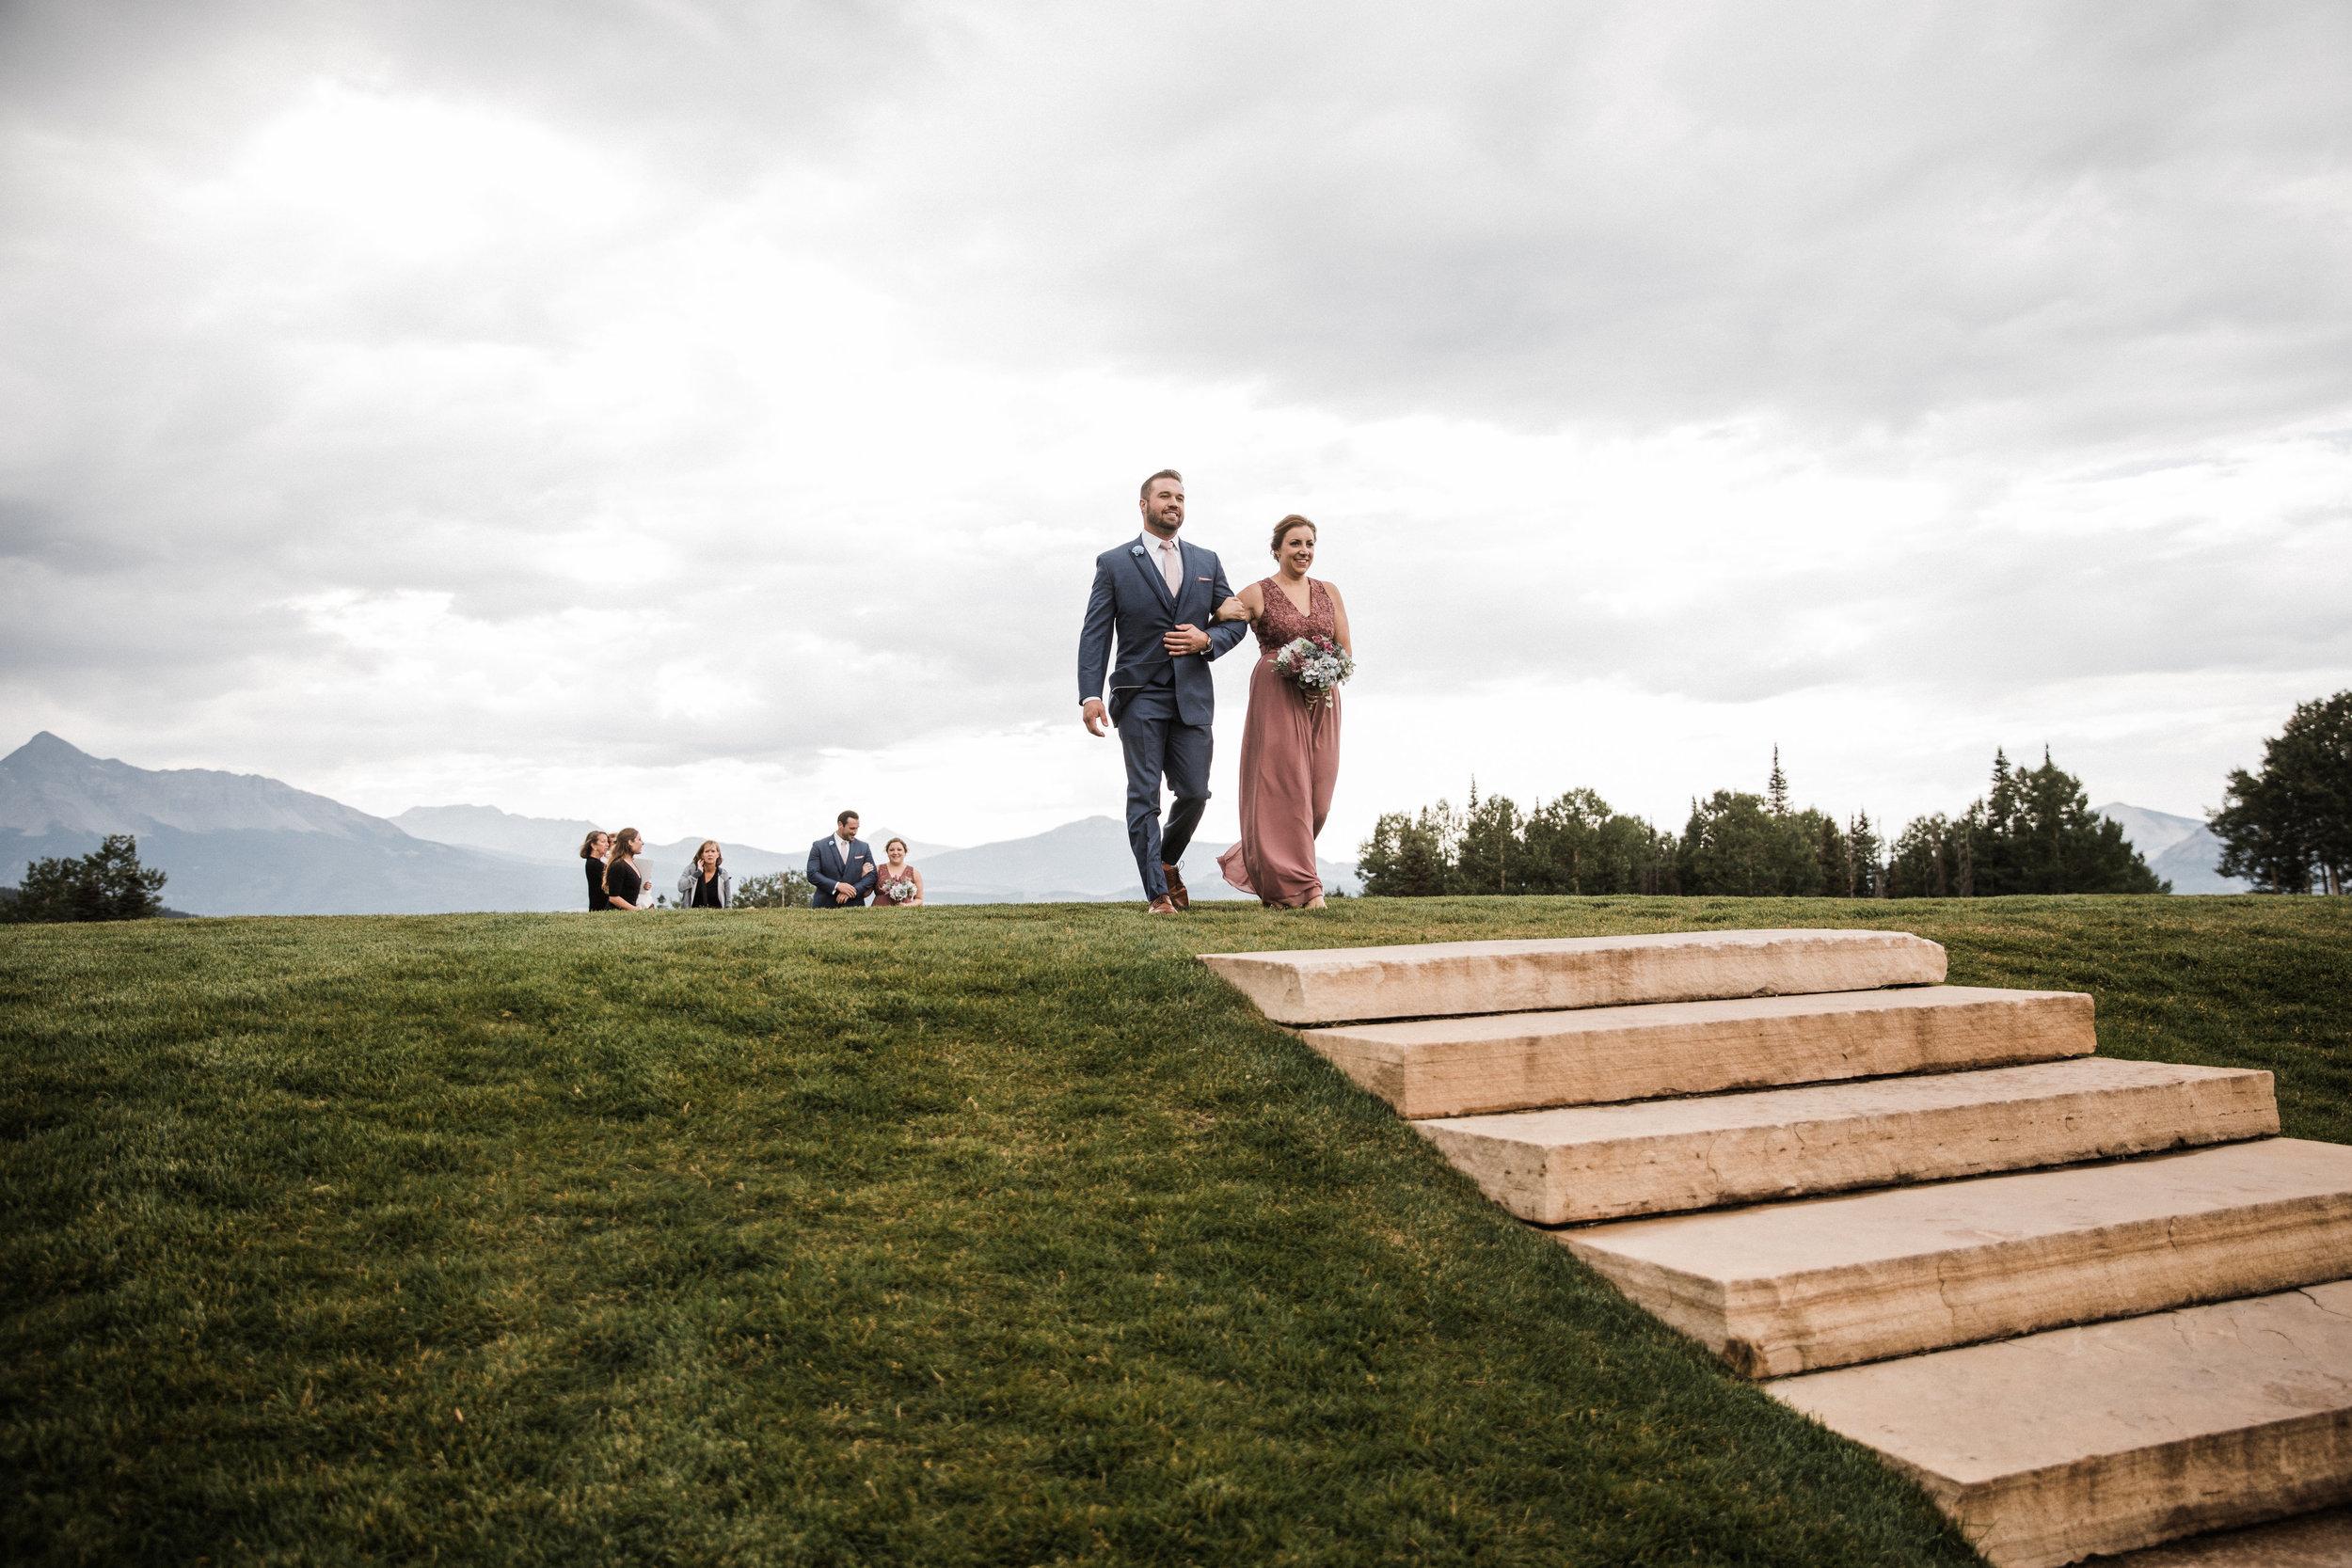 leahandashton-telluride-wedding-photography-0047.jpg